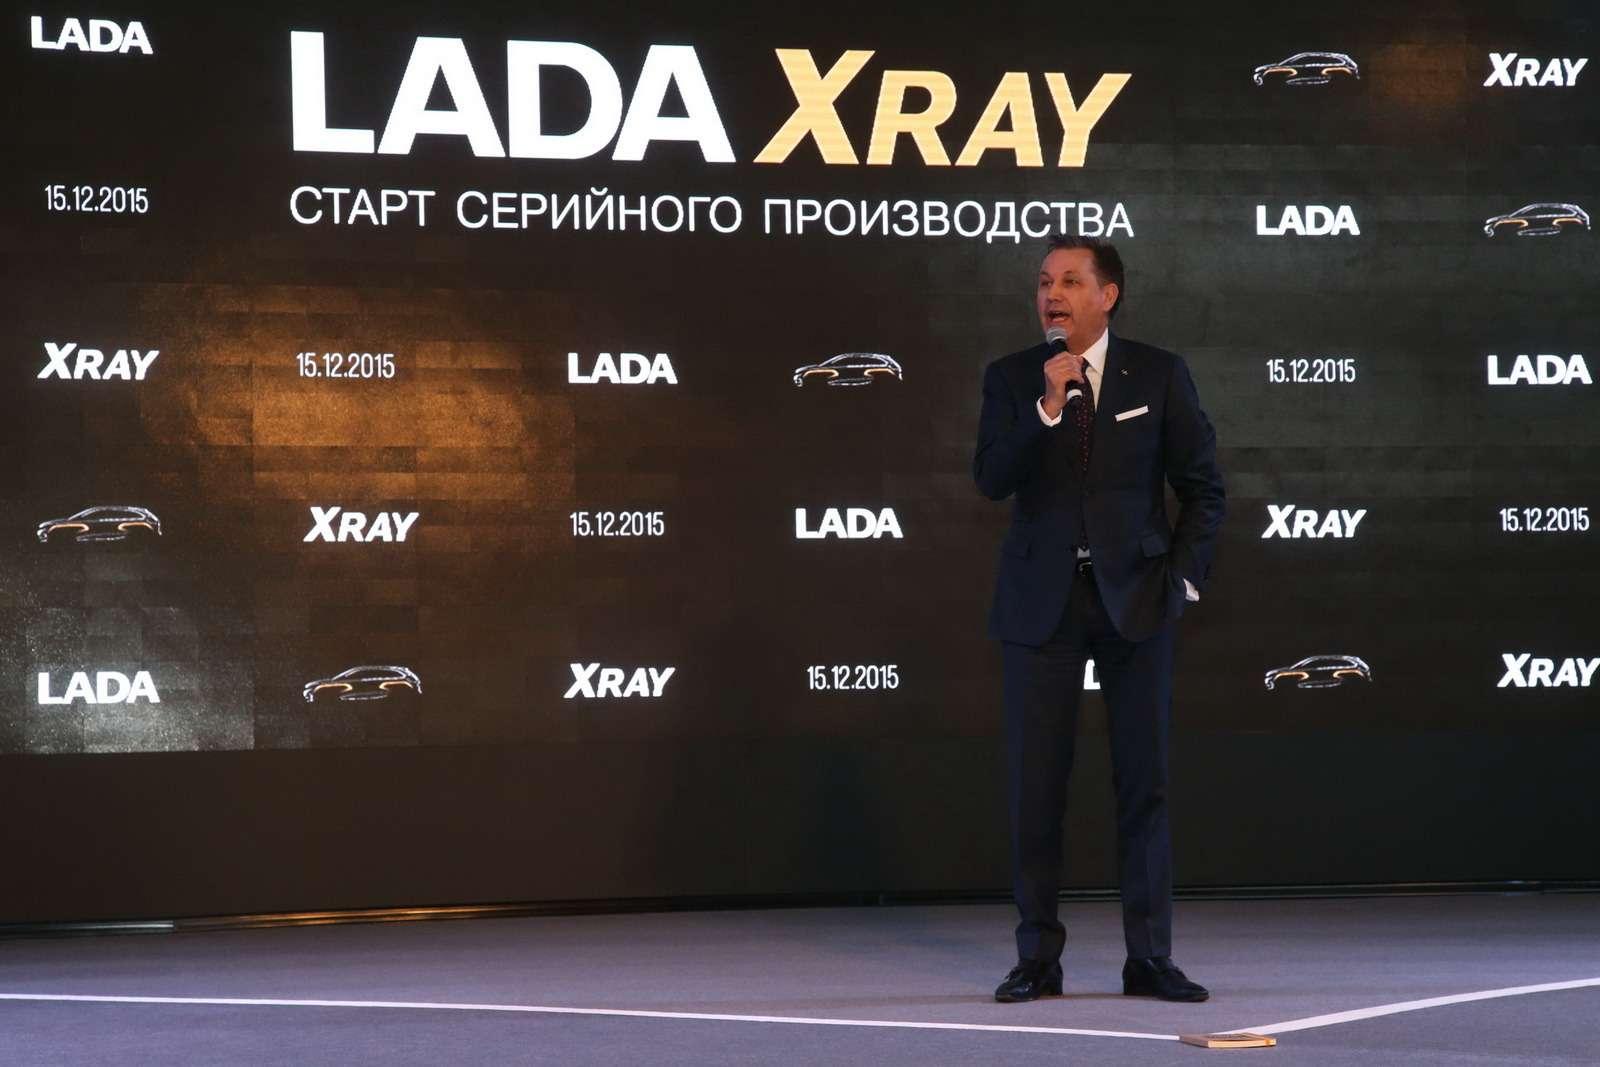 Lada XRAY 0263_новый размер